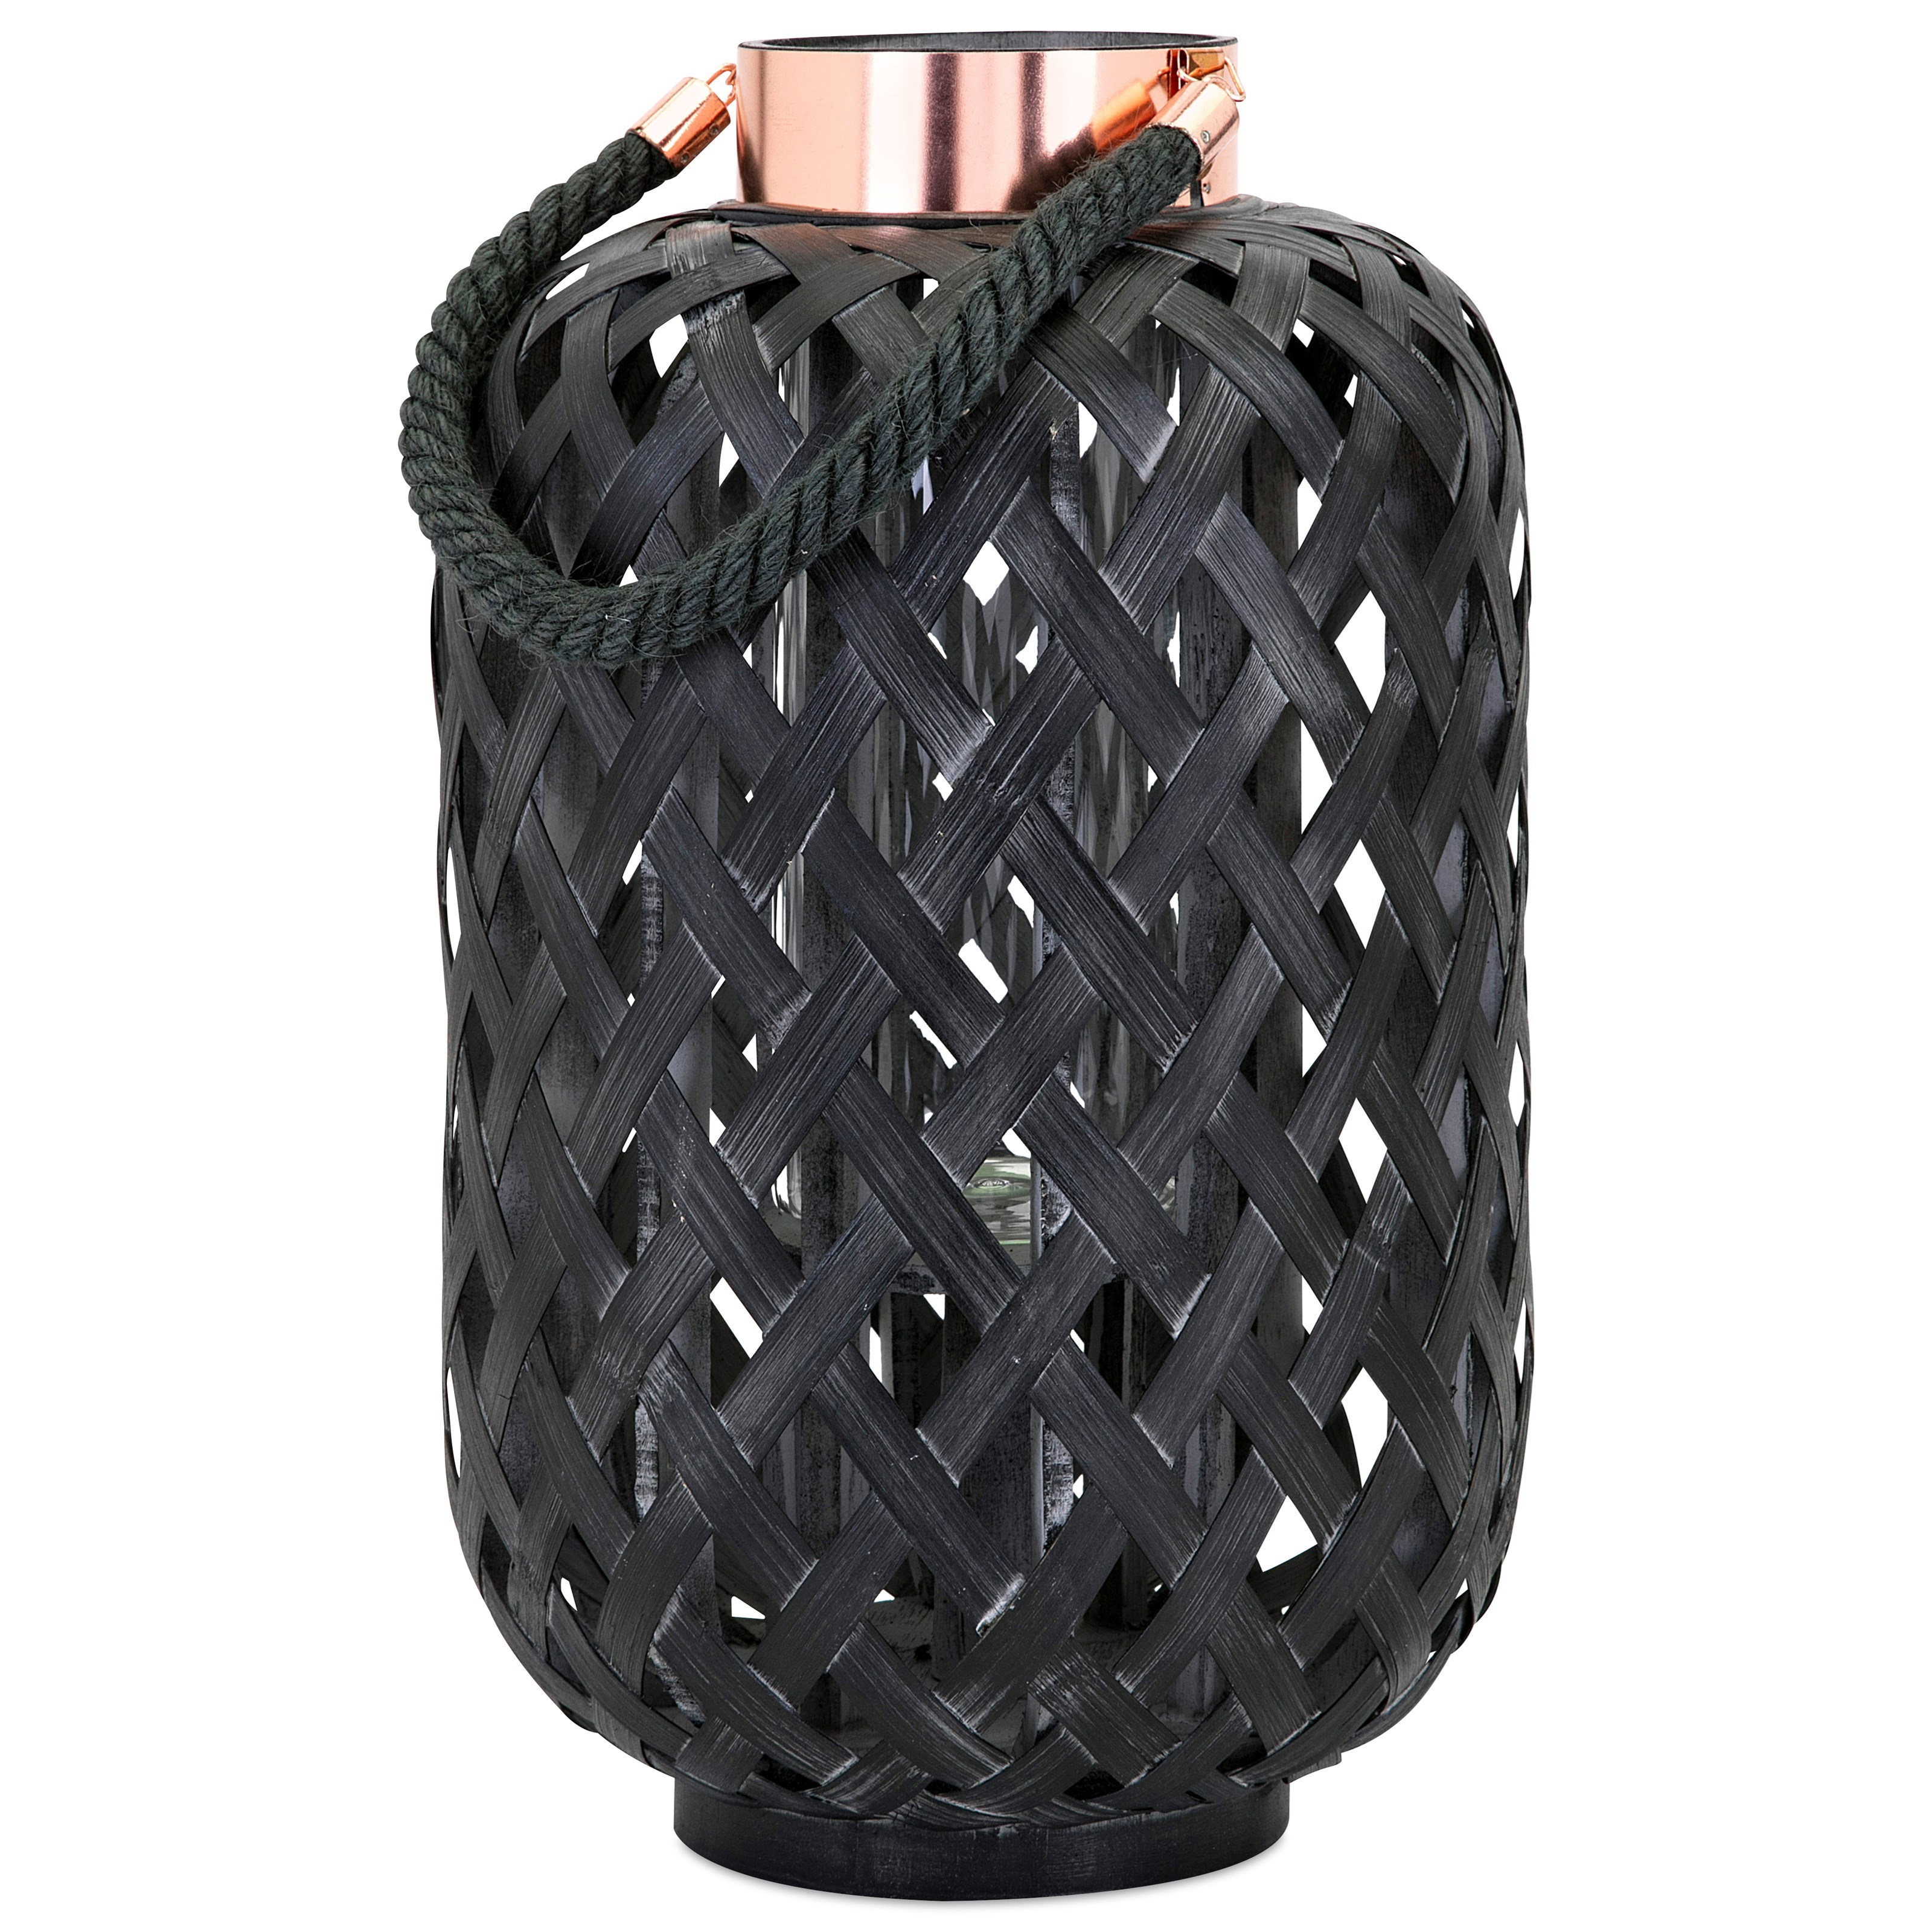 Anja Small Bamboo Lantern